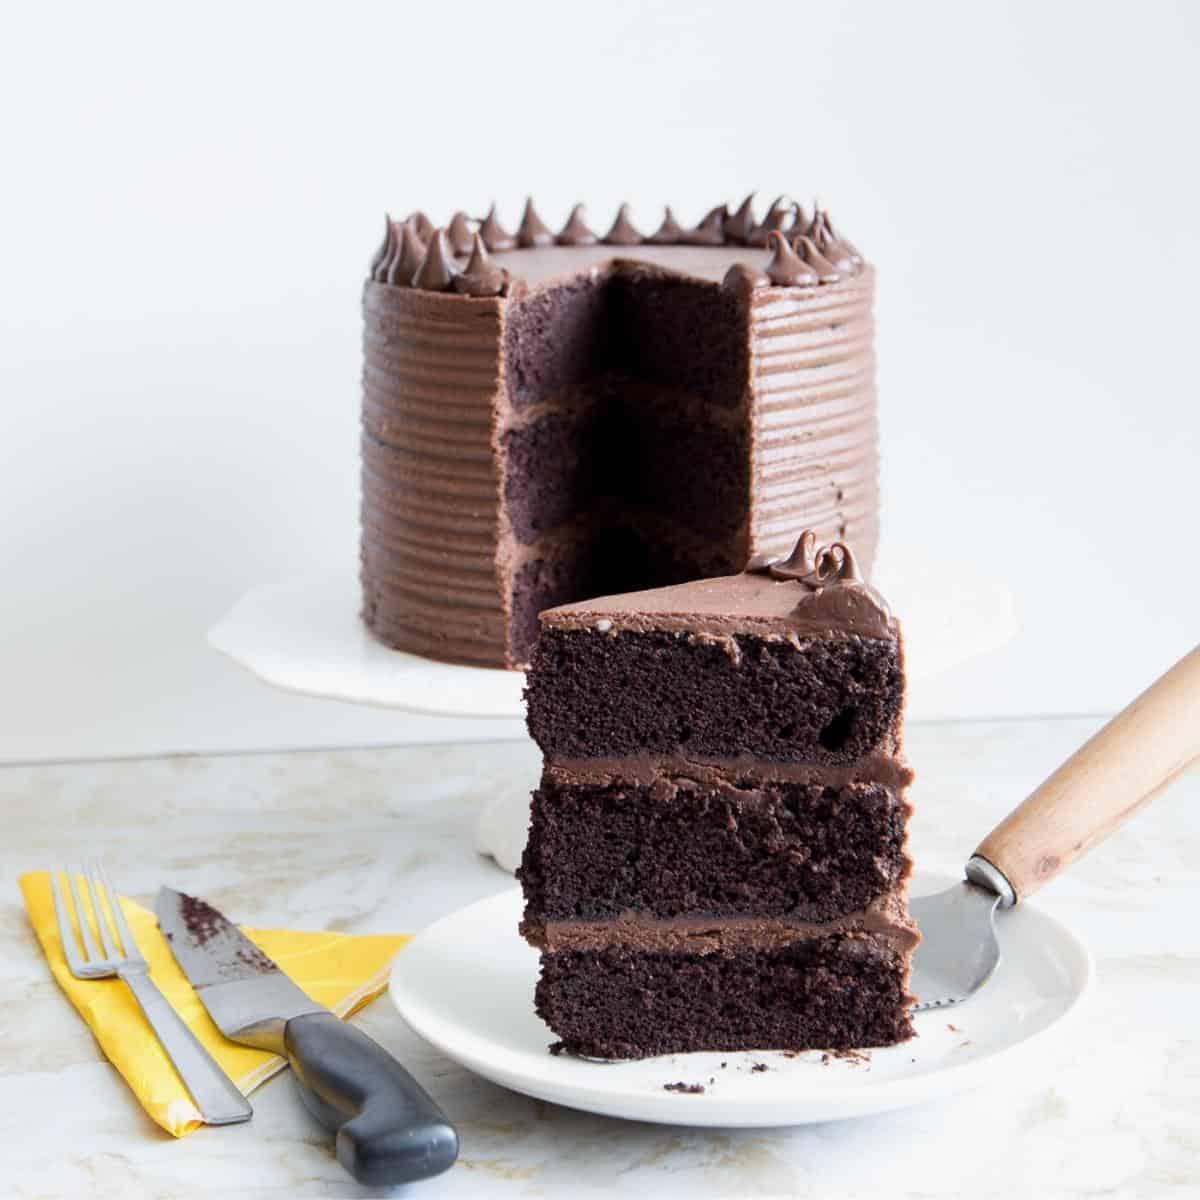 A cut slice of chocolate cake